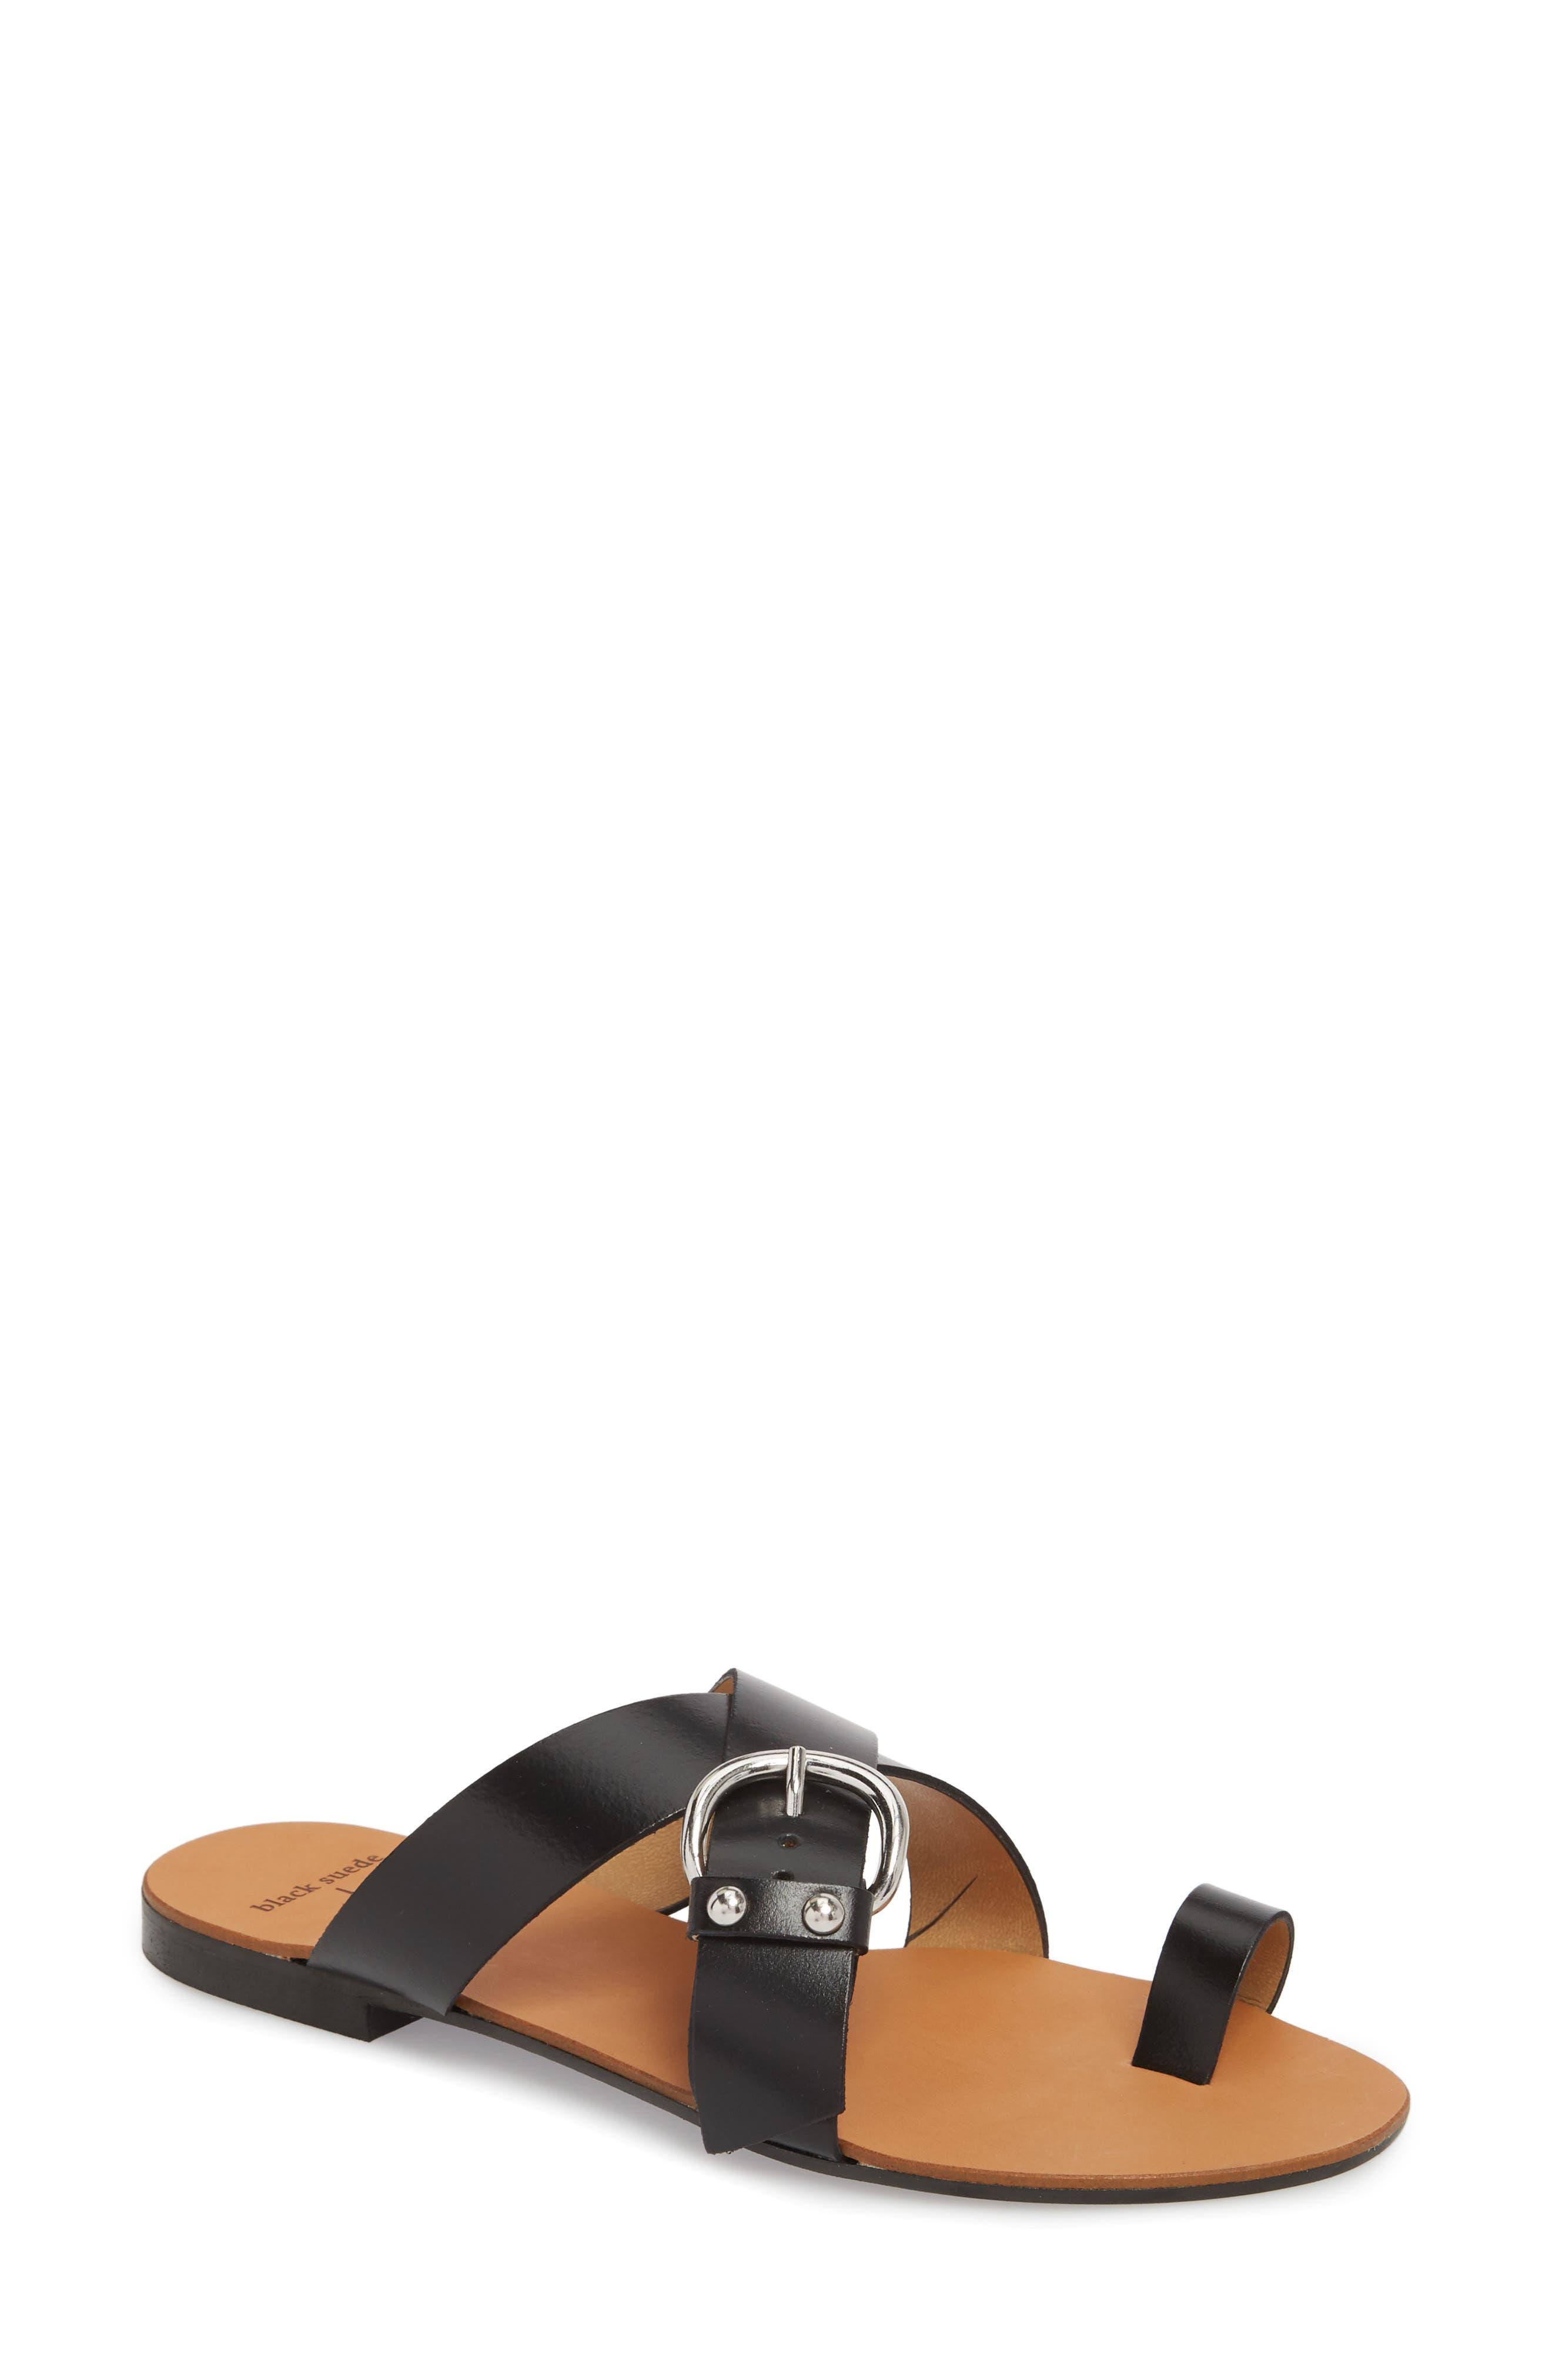 Black Suede Studio Elyse Slide Sandal, Black